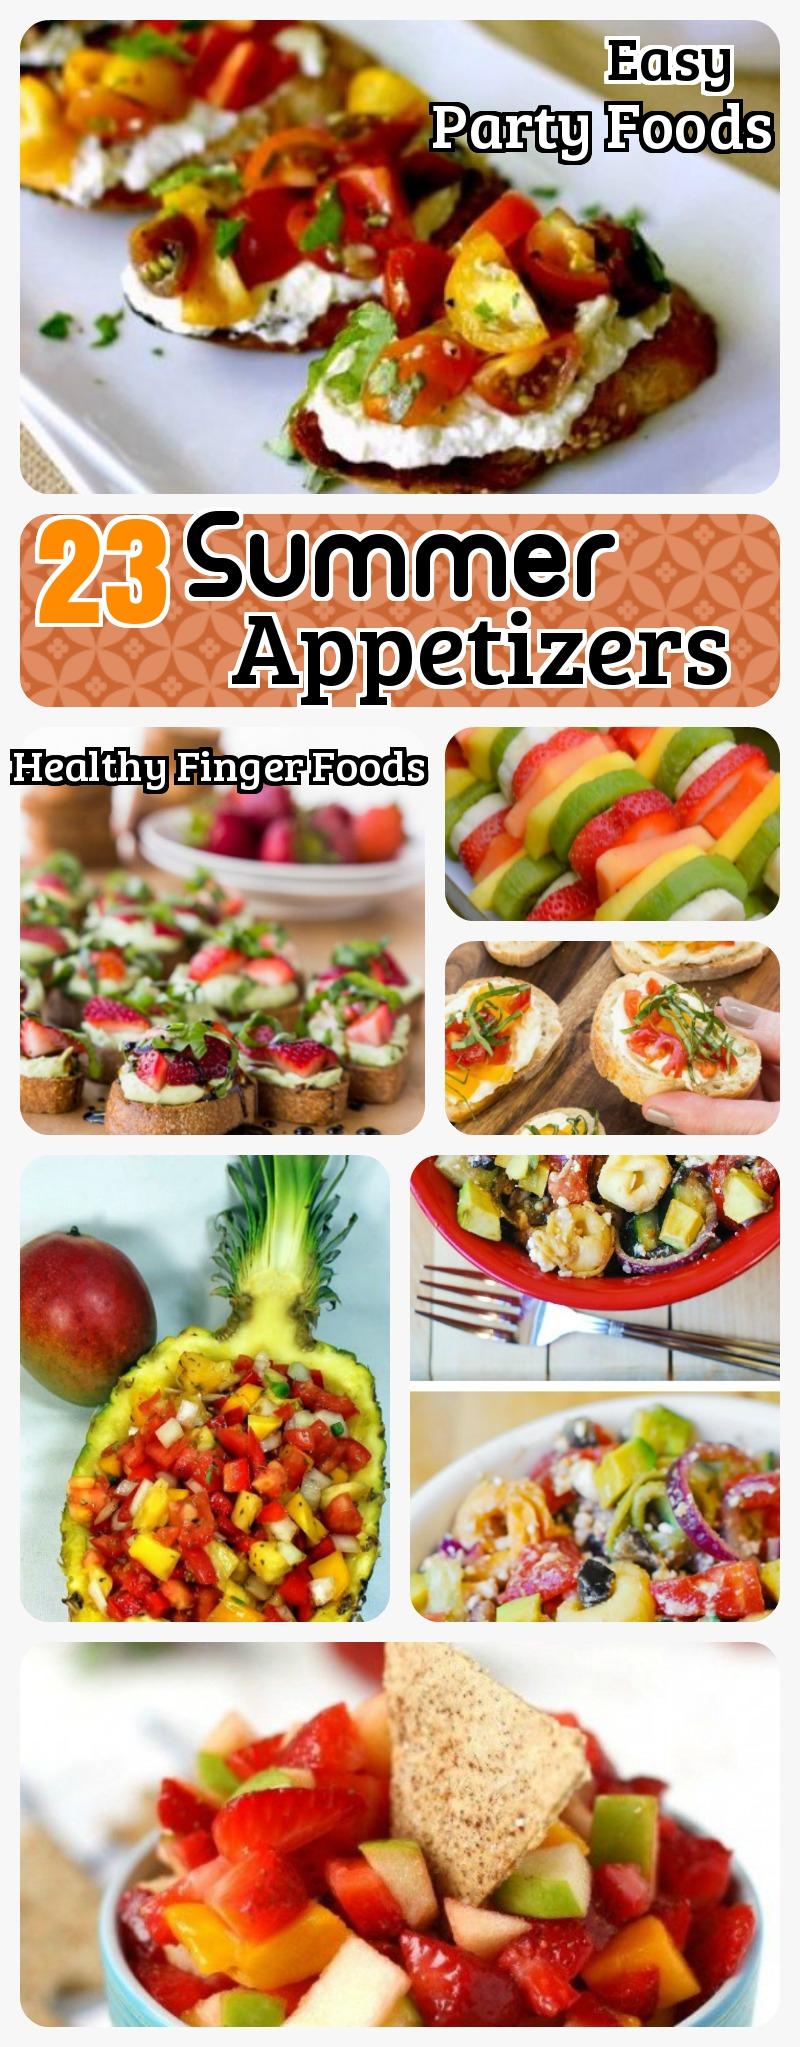 Summer Appetizers